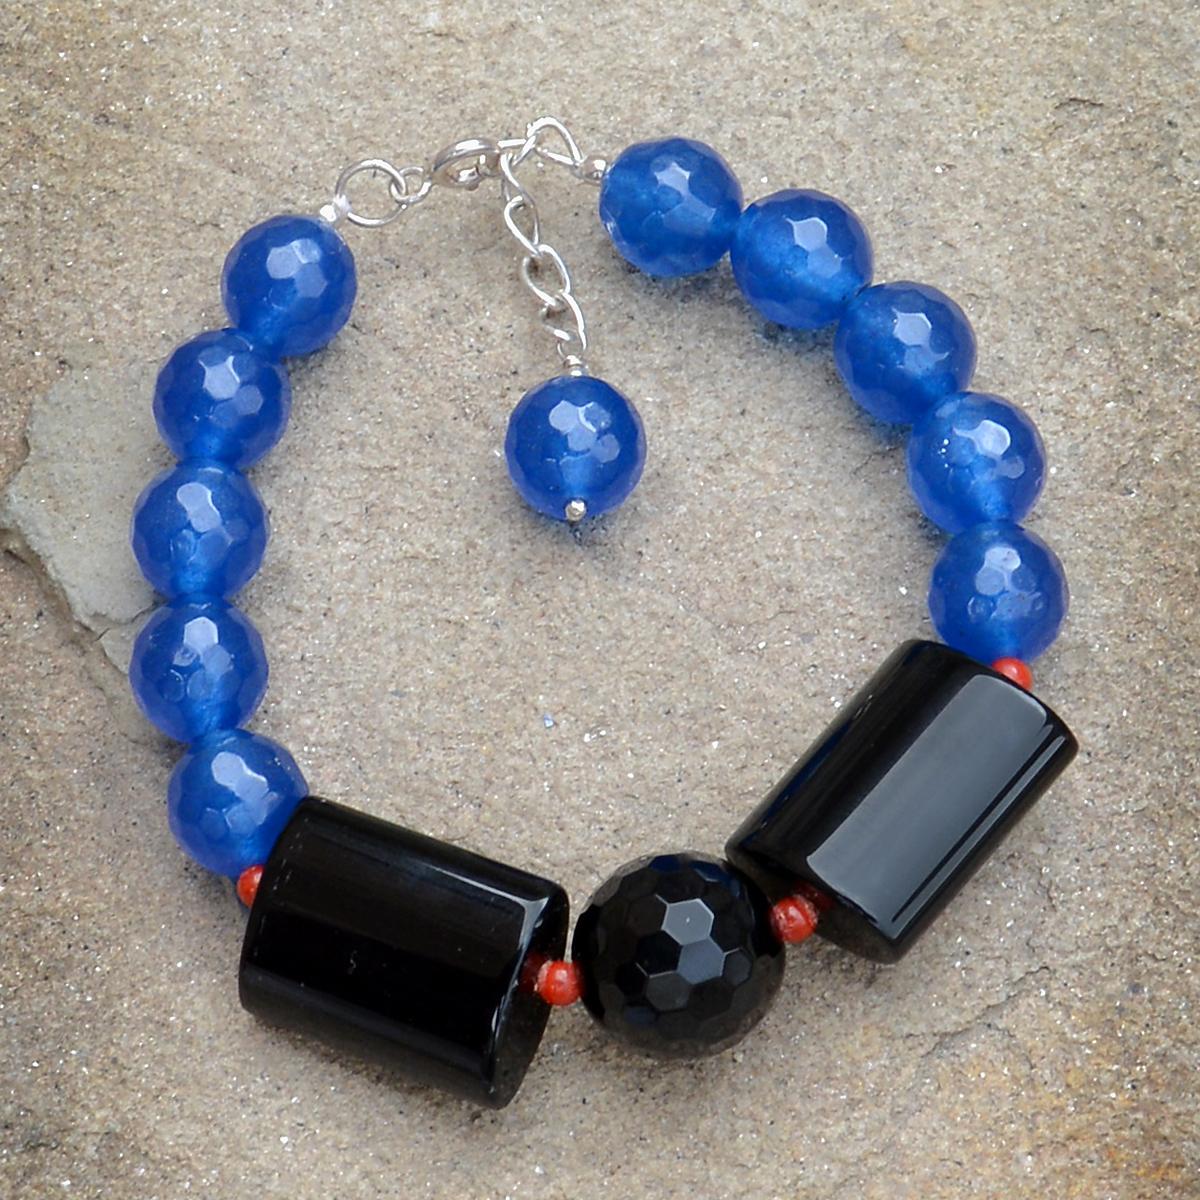 Handmade Jewelry Manufacturer Lobster-claw Hook, Round-Rectangle Black Onyx & Blue Quartz, 925 Sterling Silver Bracelet Jaipur Rajasthan India